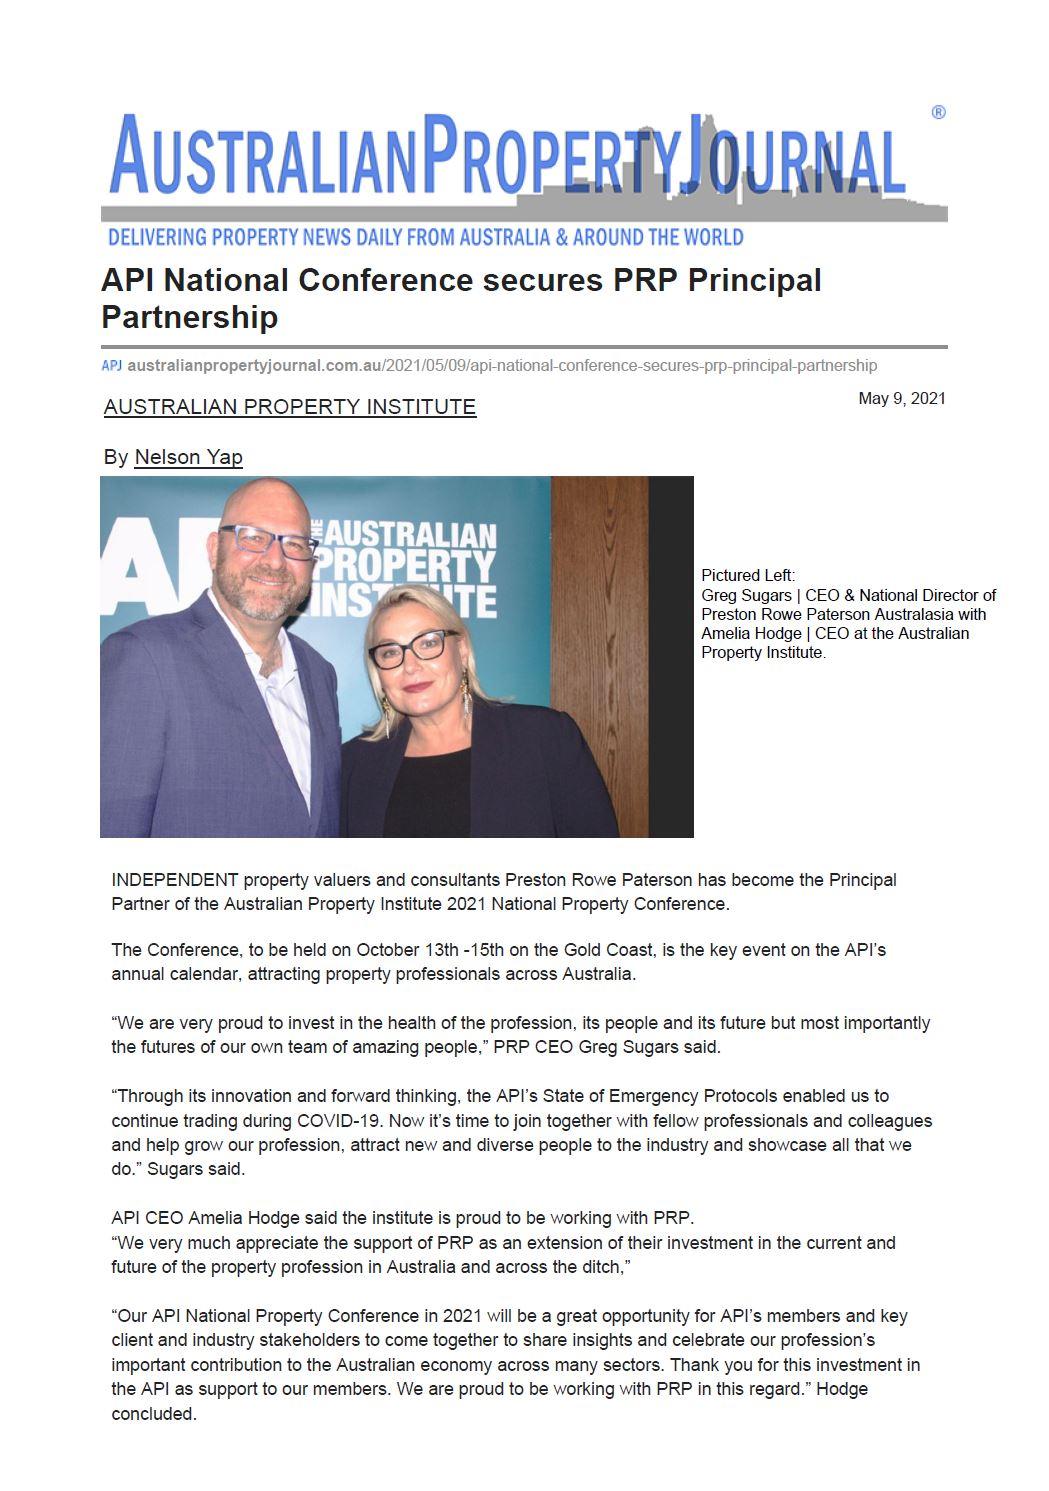 APJ Article - 09/05/2021 API National Conference Secures PRP Principal Partnership